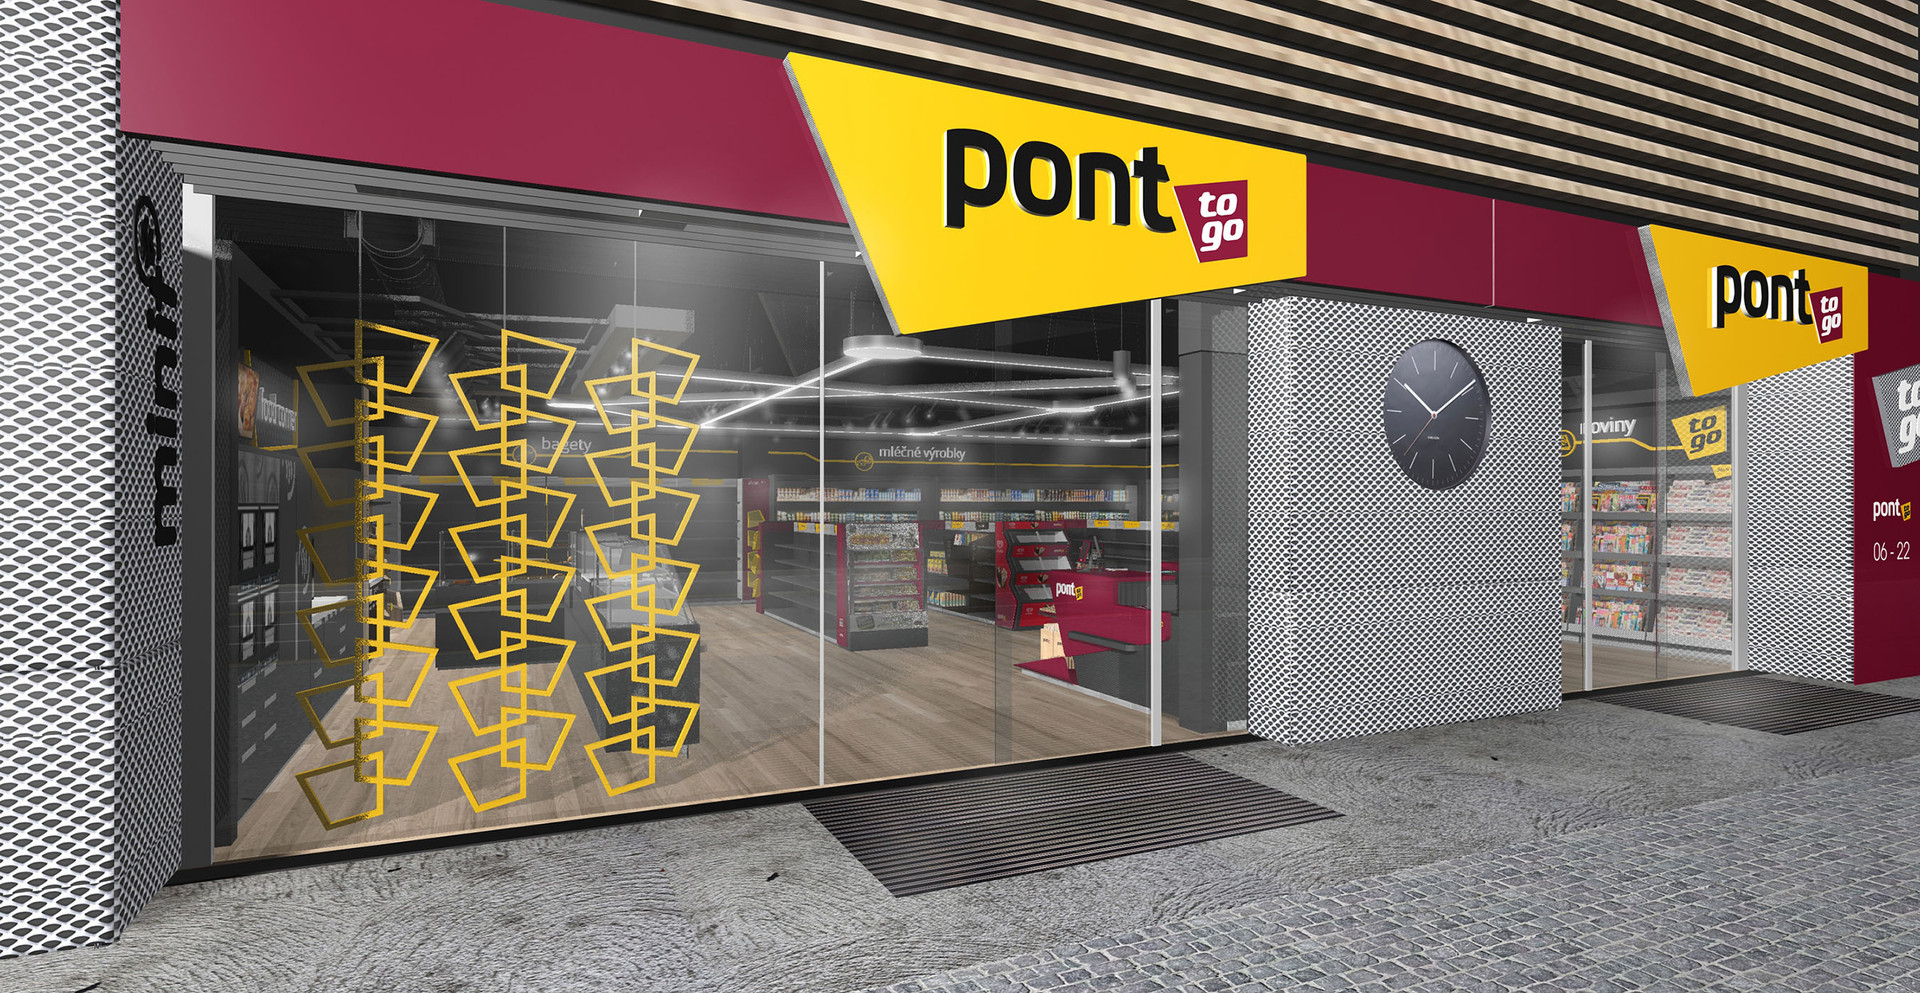 PONT to go_002.jpg